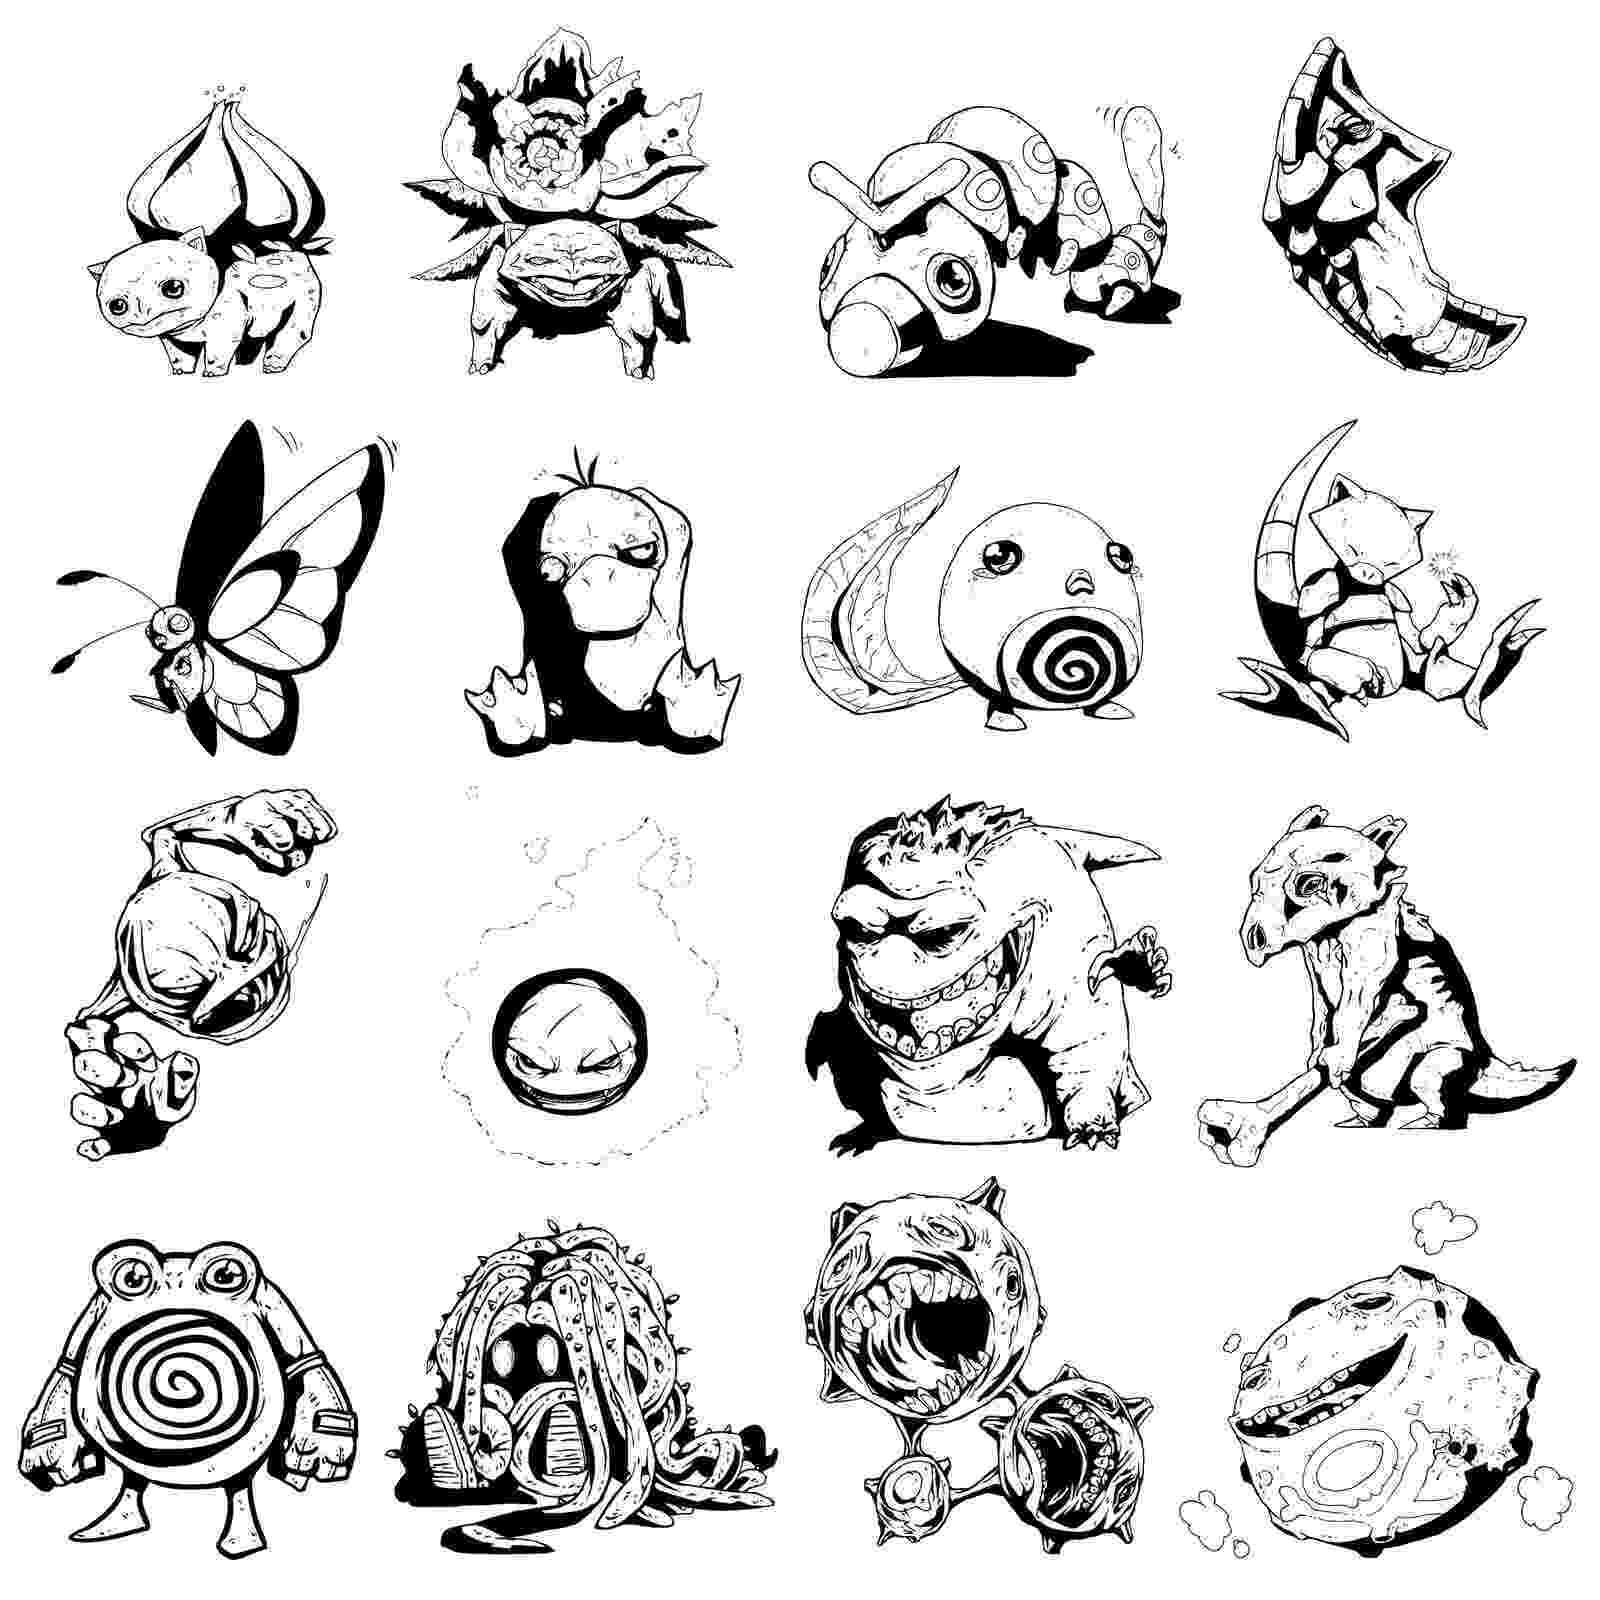 generation 2 pokemon click to see printable version of piloswine coloring page 2 generation pokemon